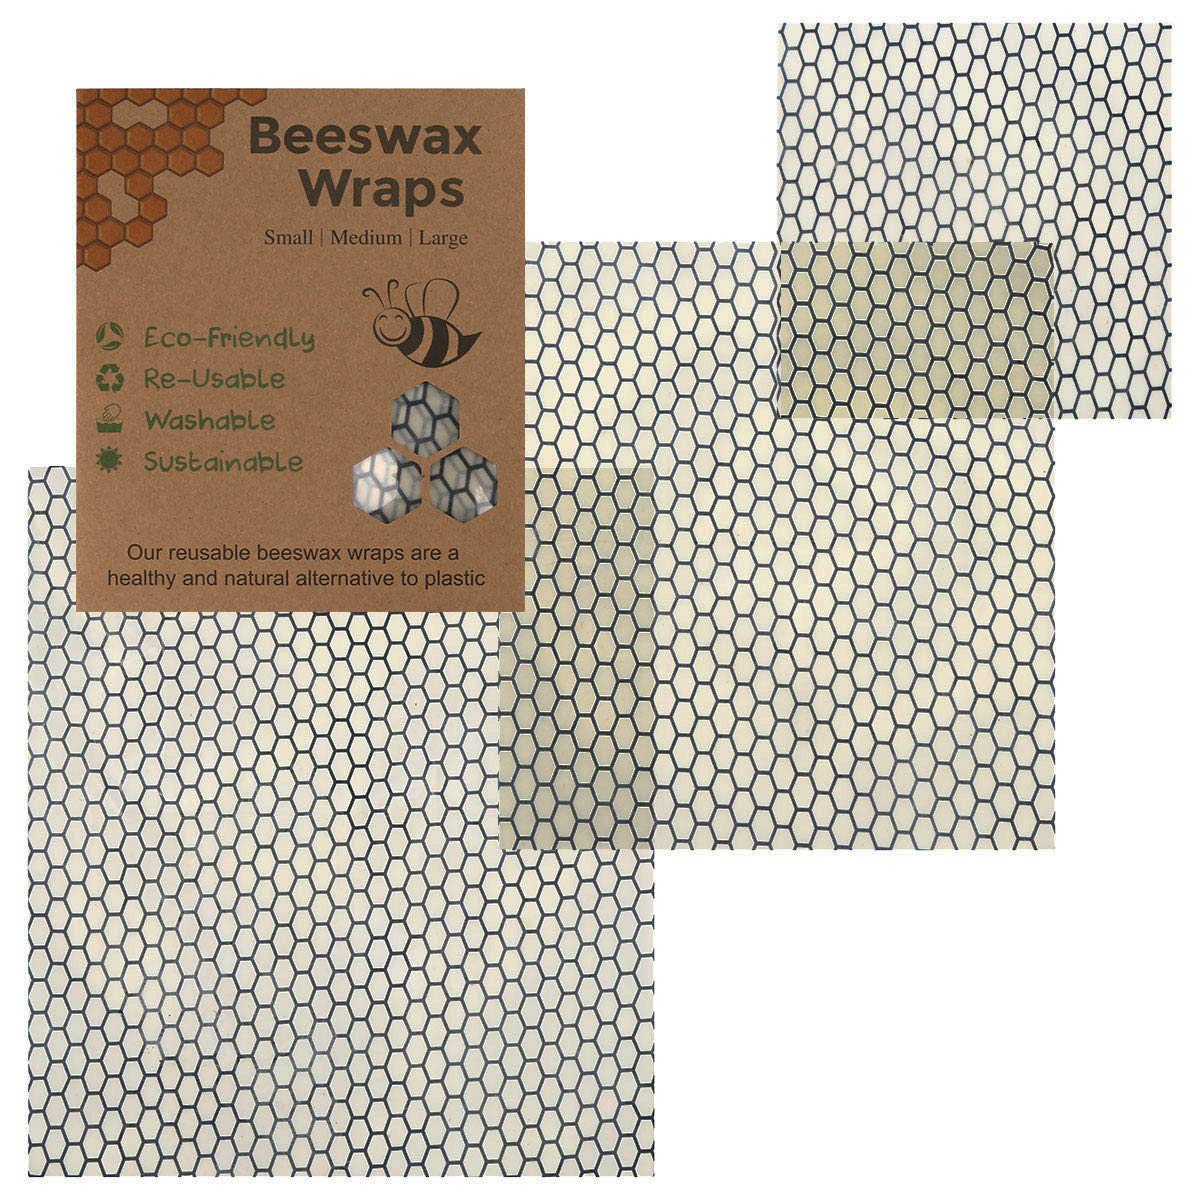 Pack of 3, Reusable Beewax Food Wrap, Zero Waste, Eco Friendly, Reusable Sandwich Wrap, Wax Food Wrap, by Crystal Lemon